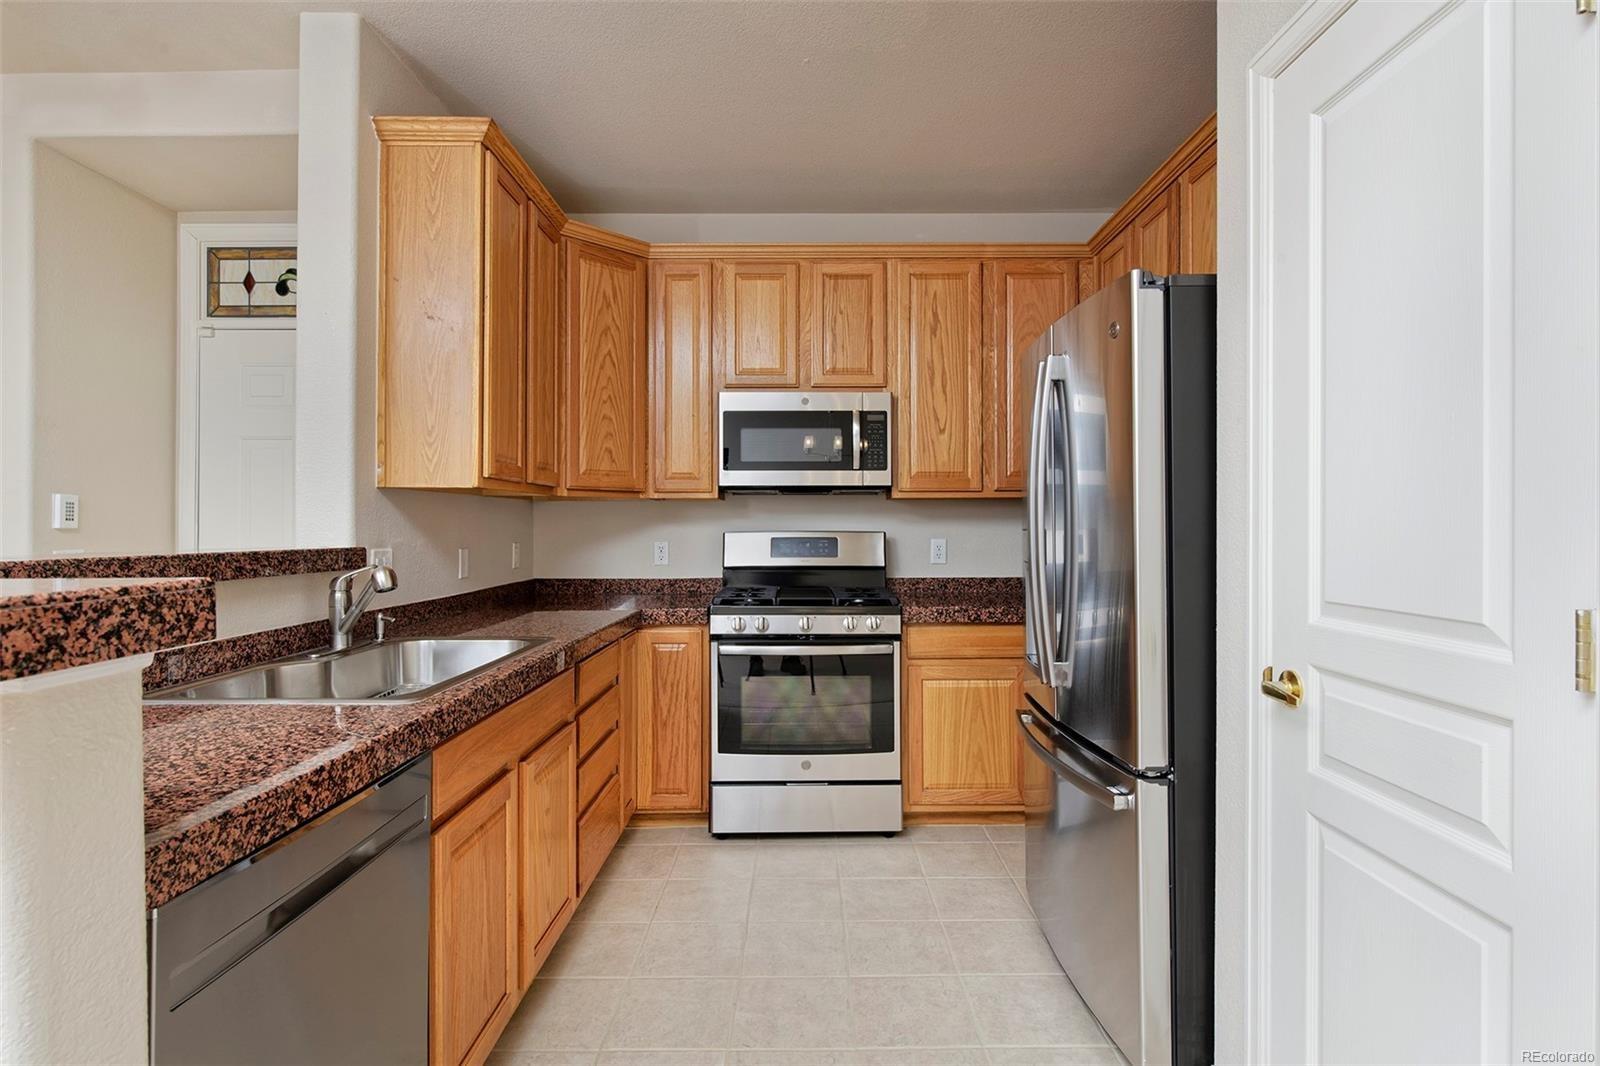 MLS# 3797326 - 1 - 10437  W Hampden Avenue, Lakewood, CO 80227